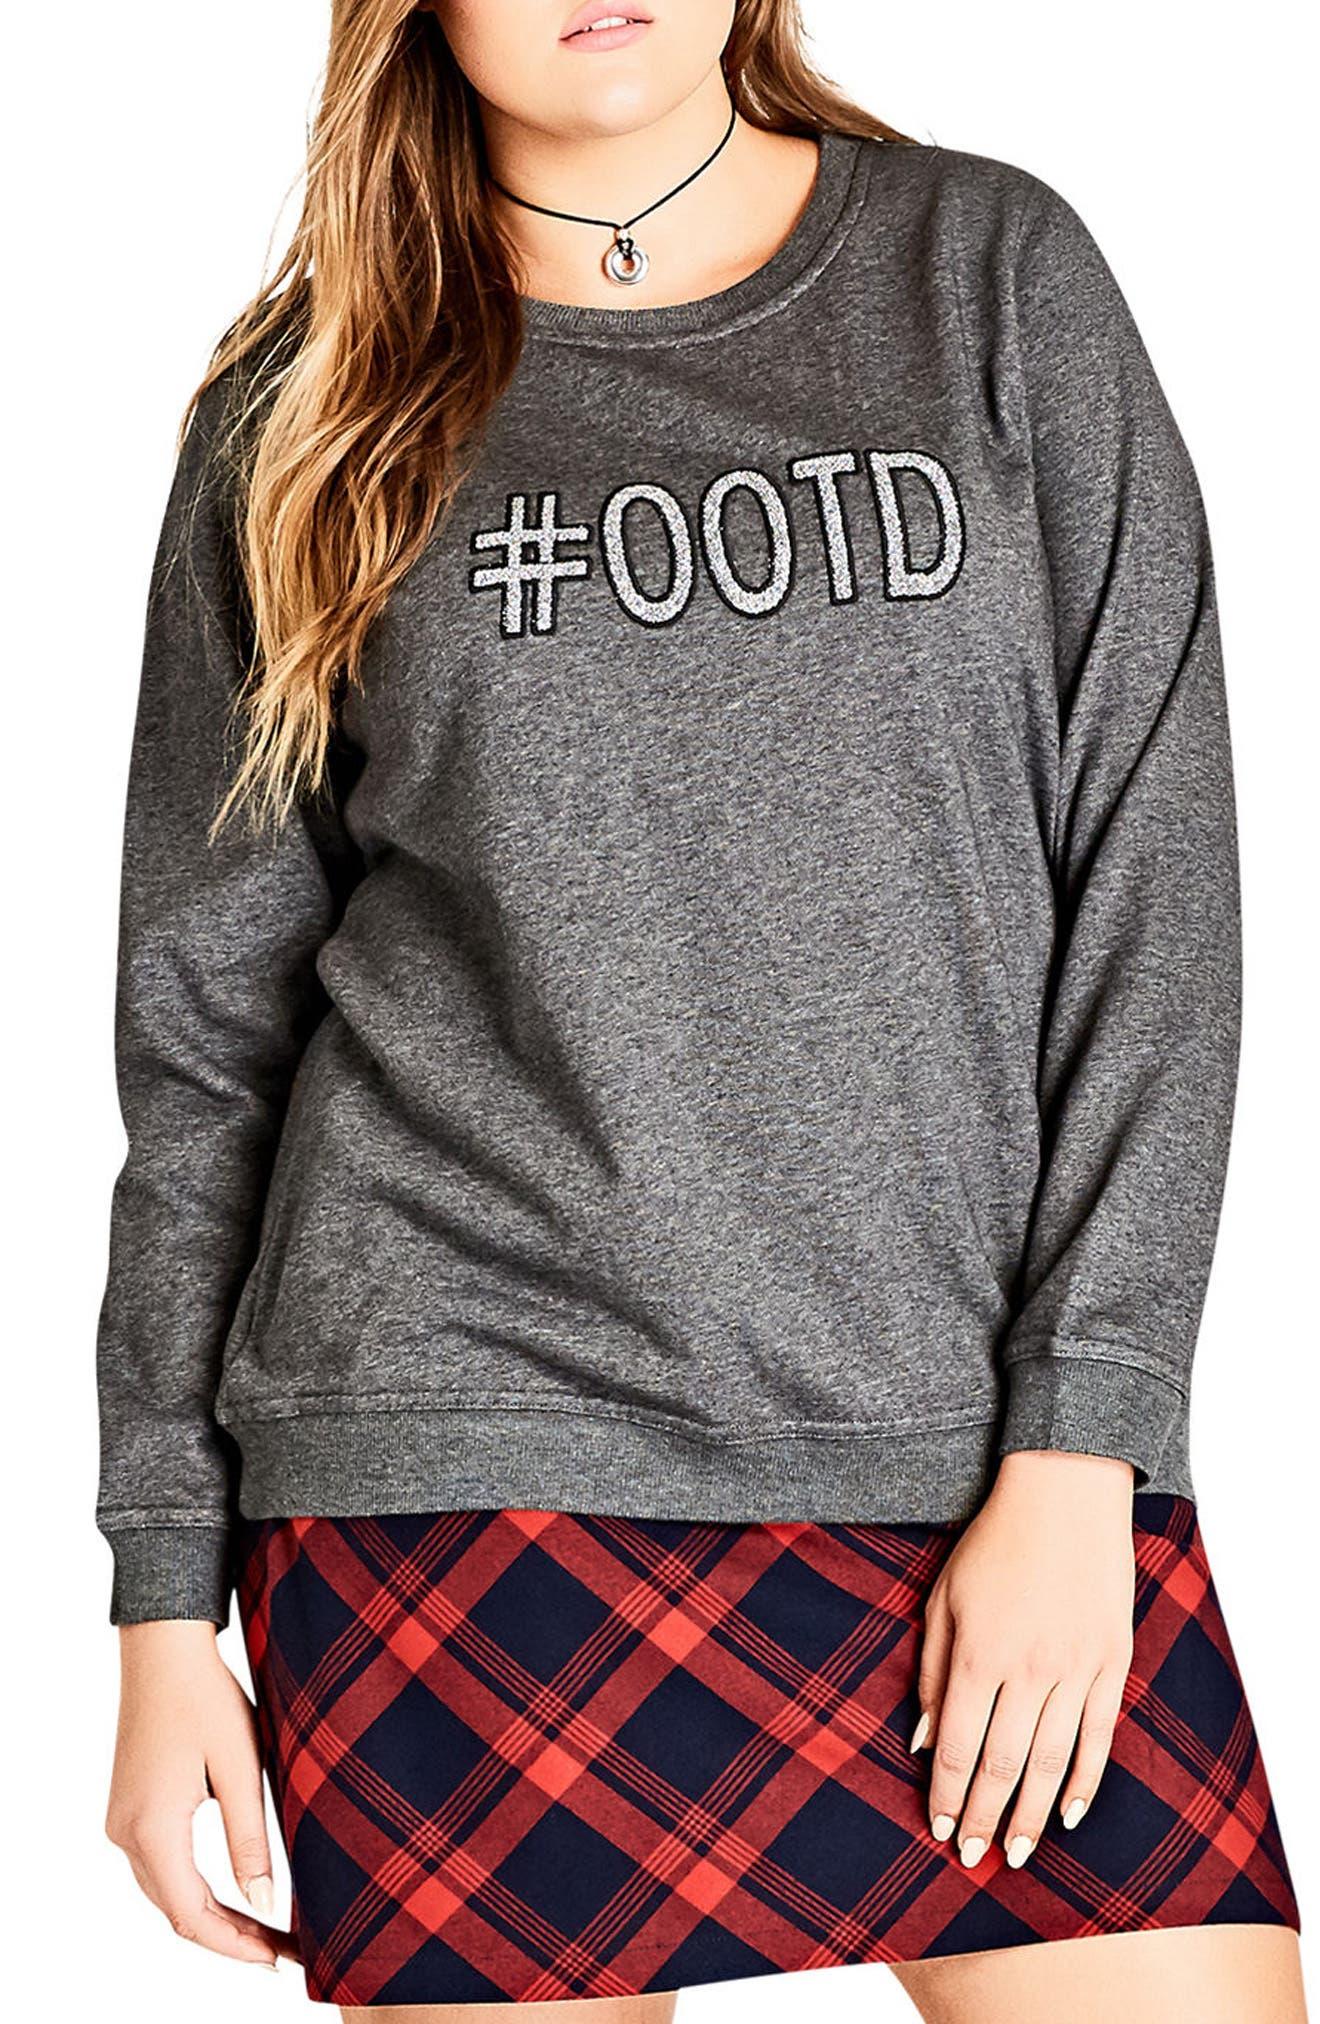 #OOTD Sweatshirt,                         Main,                         color, Grey Marle